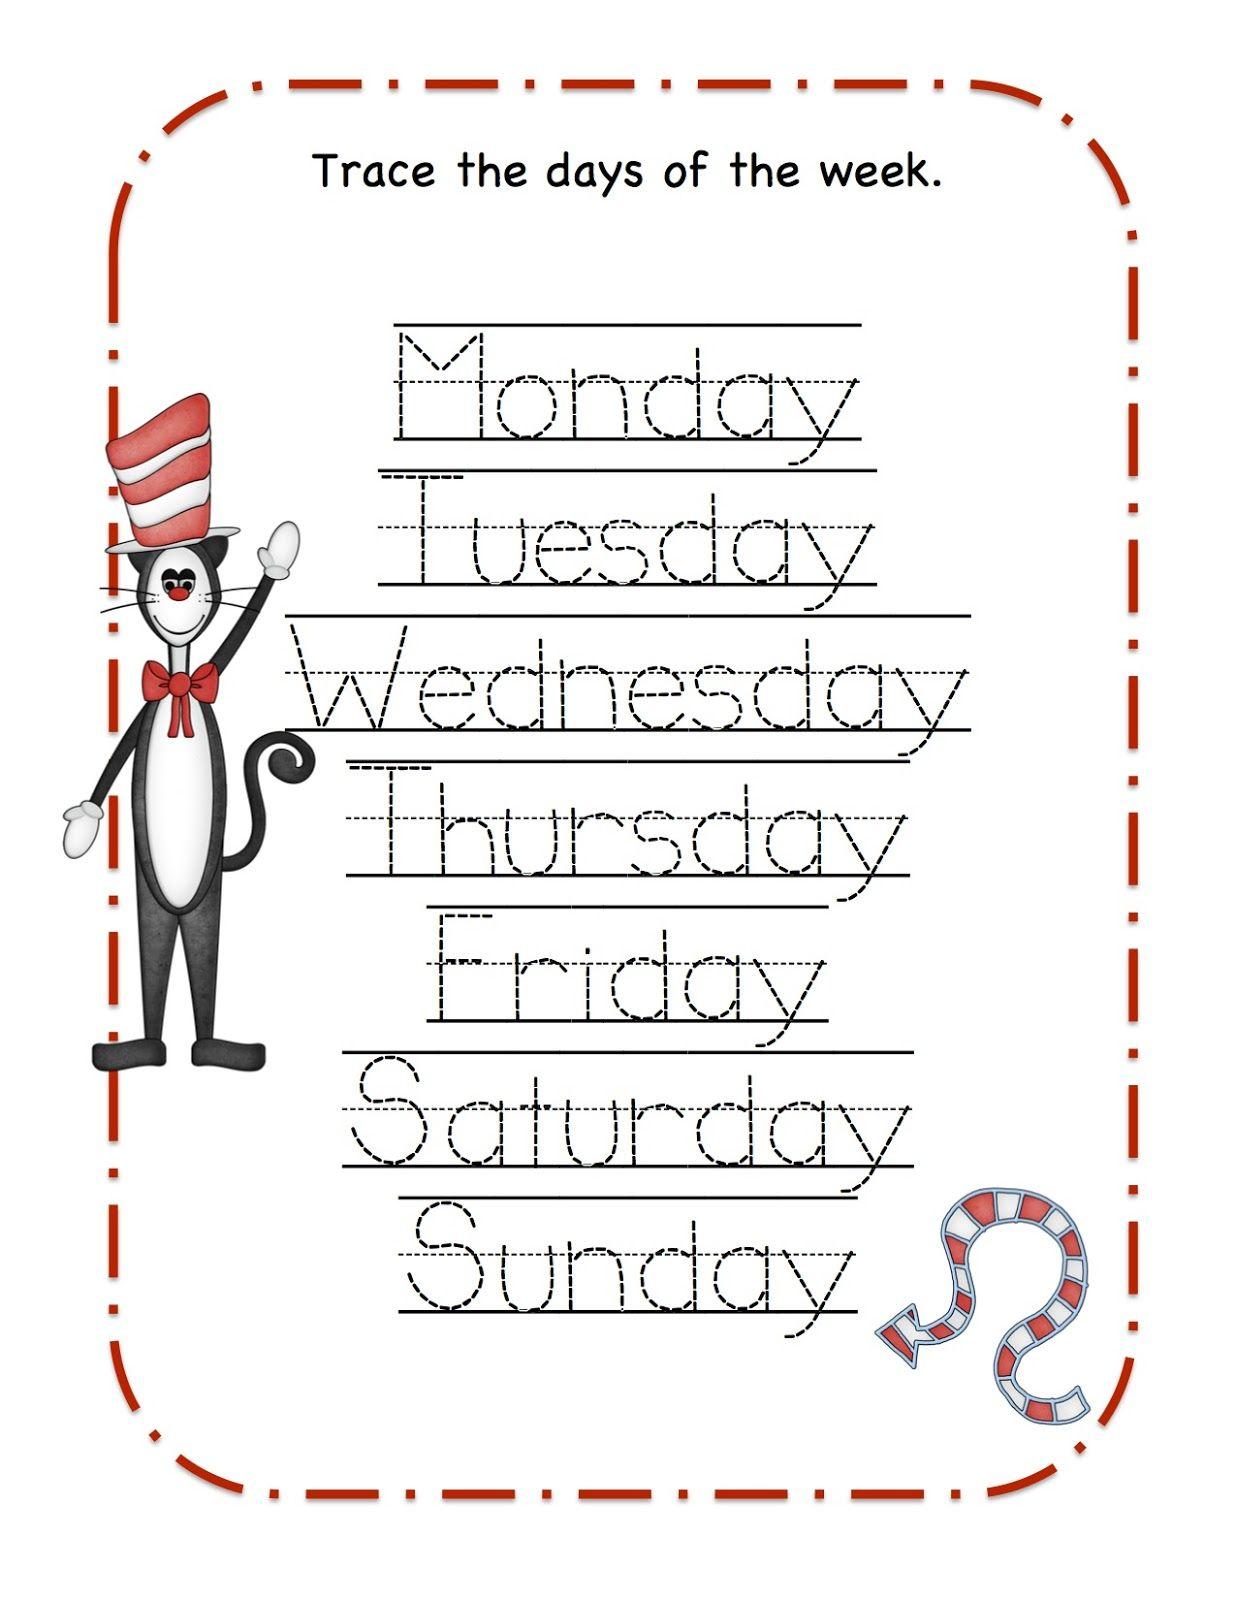 Preschool Printables: Dr. Seuss | School misc | Pinterest ...